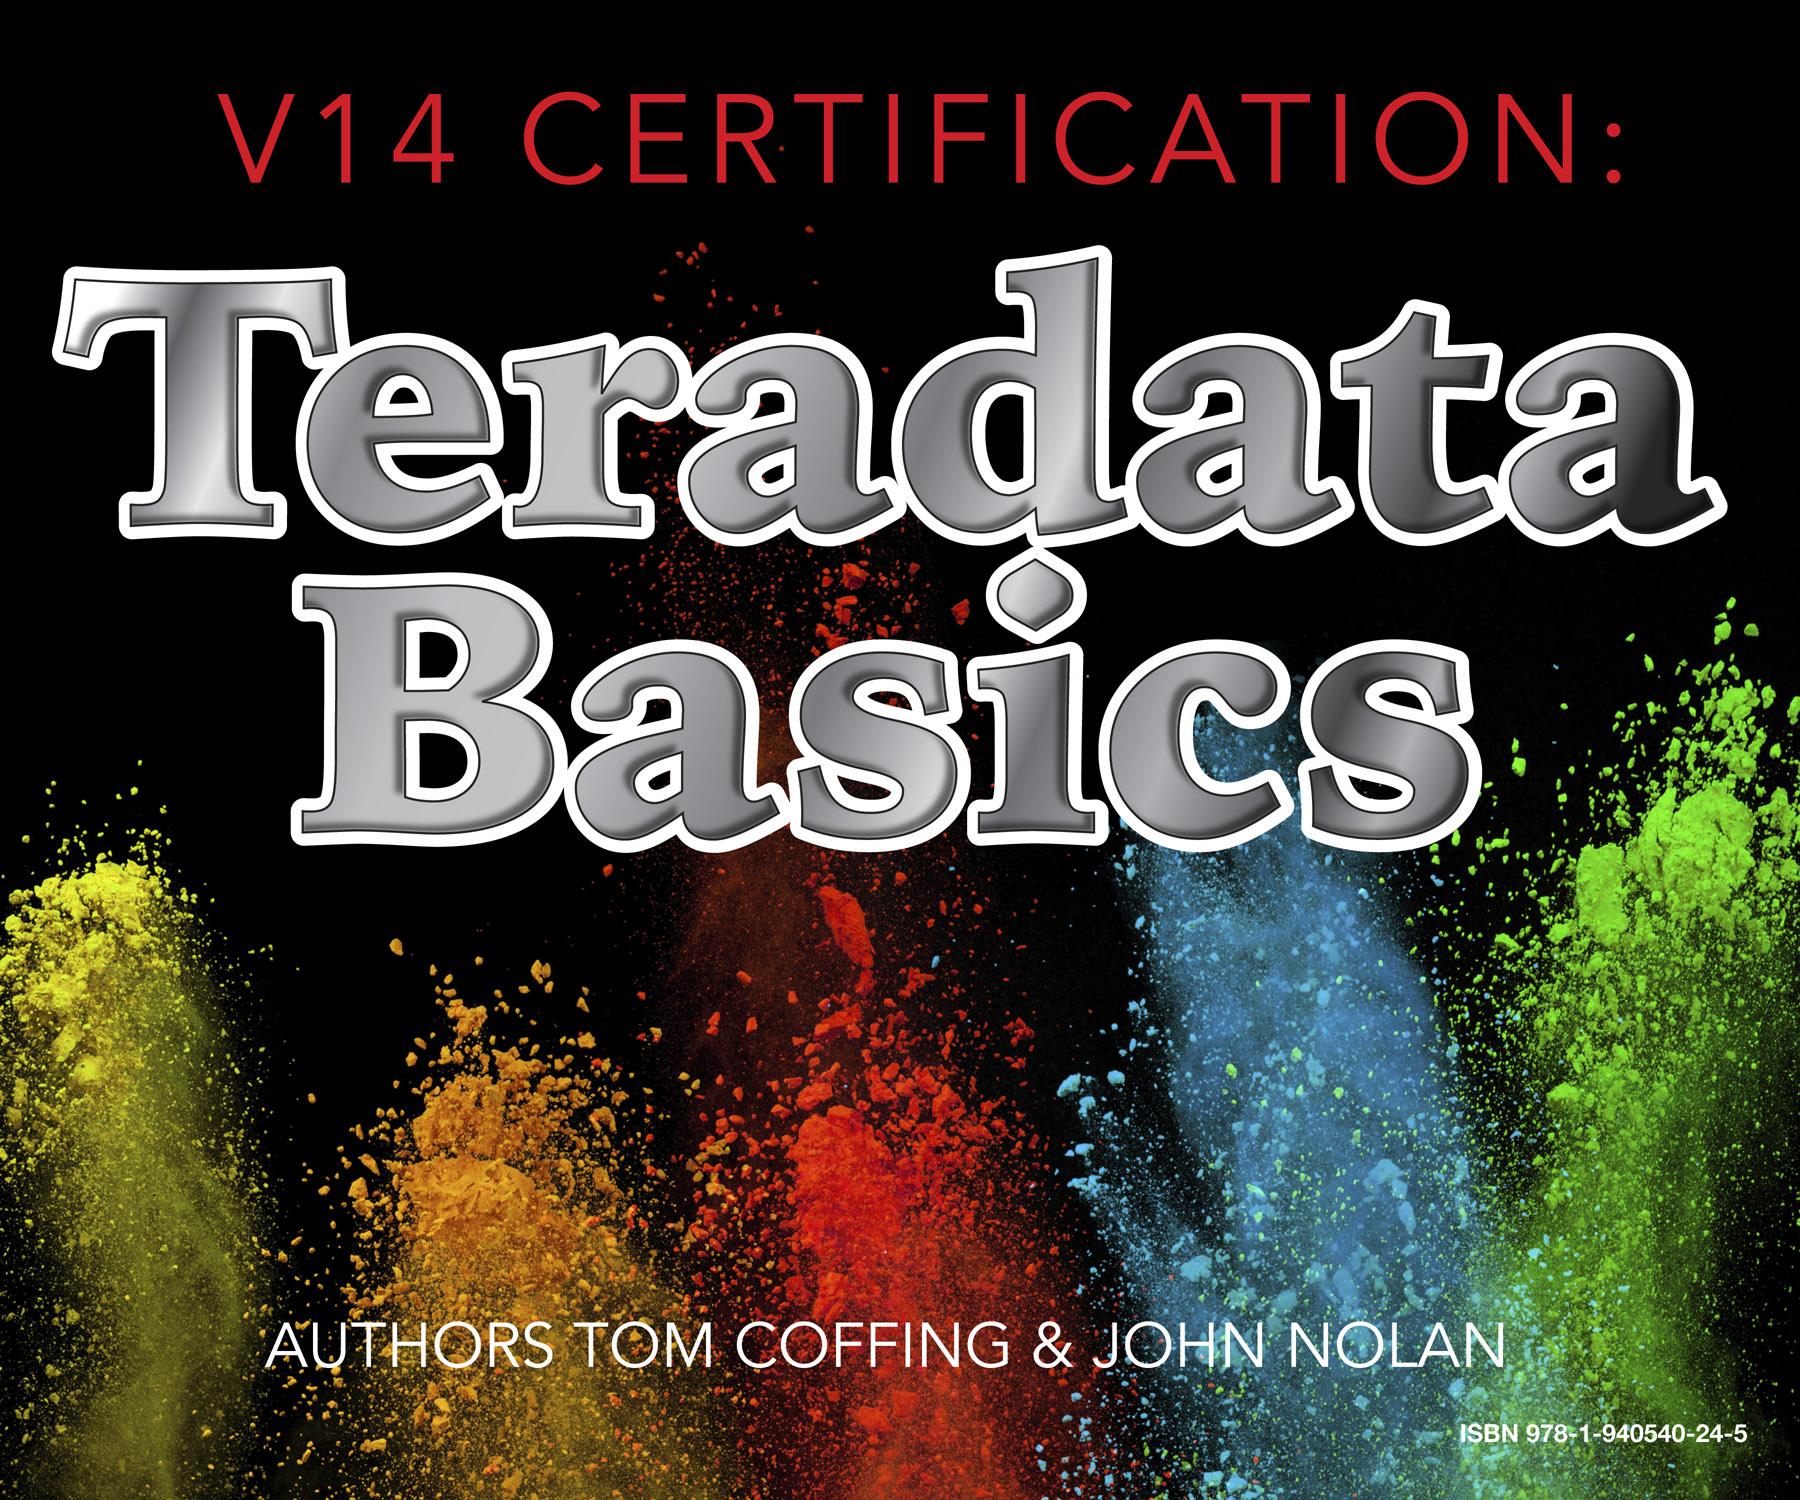 V14 Certification Teradata Basics Coffingdw